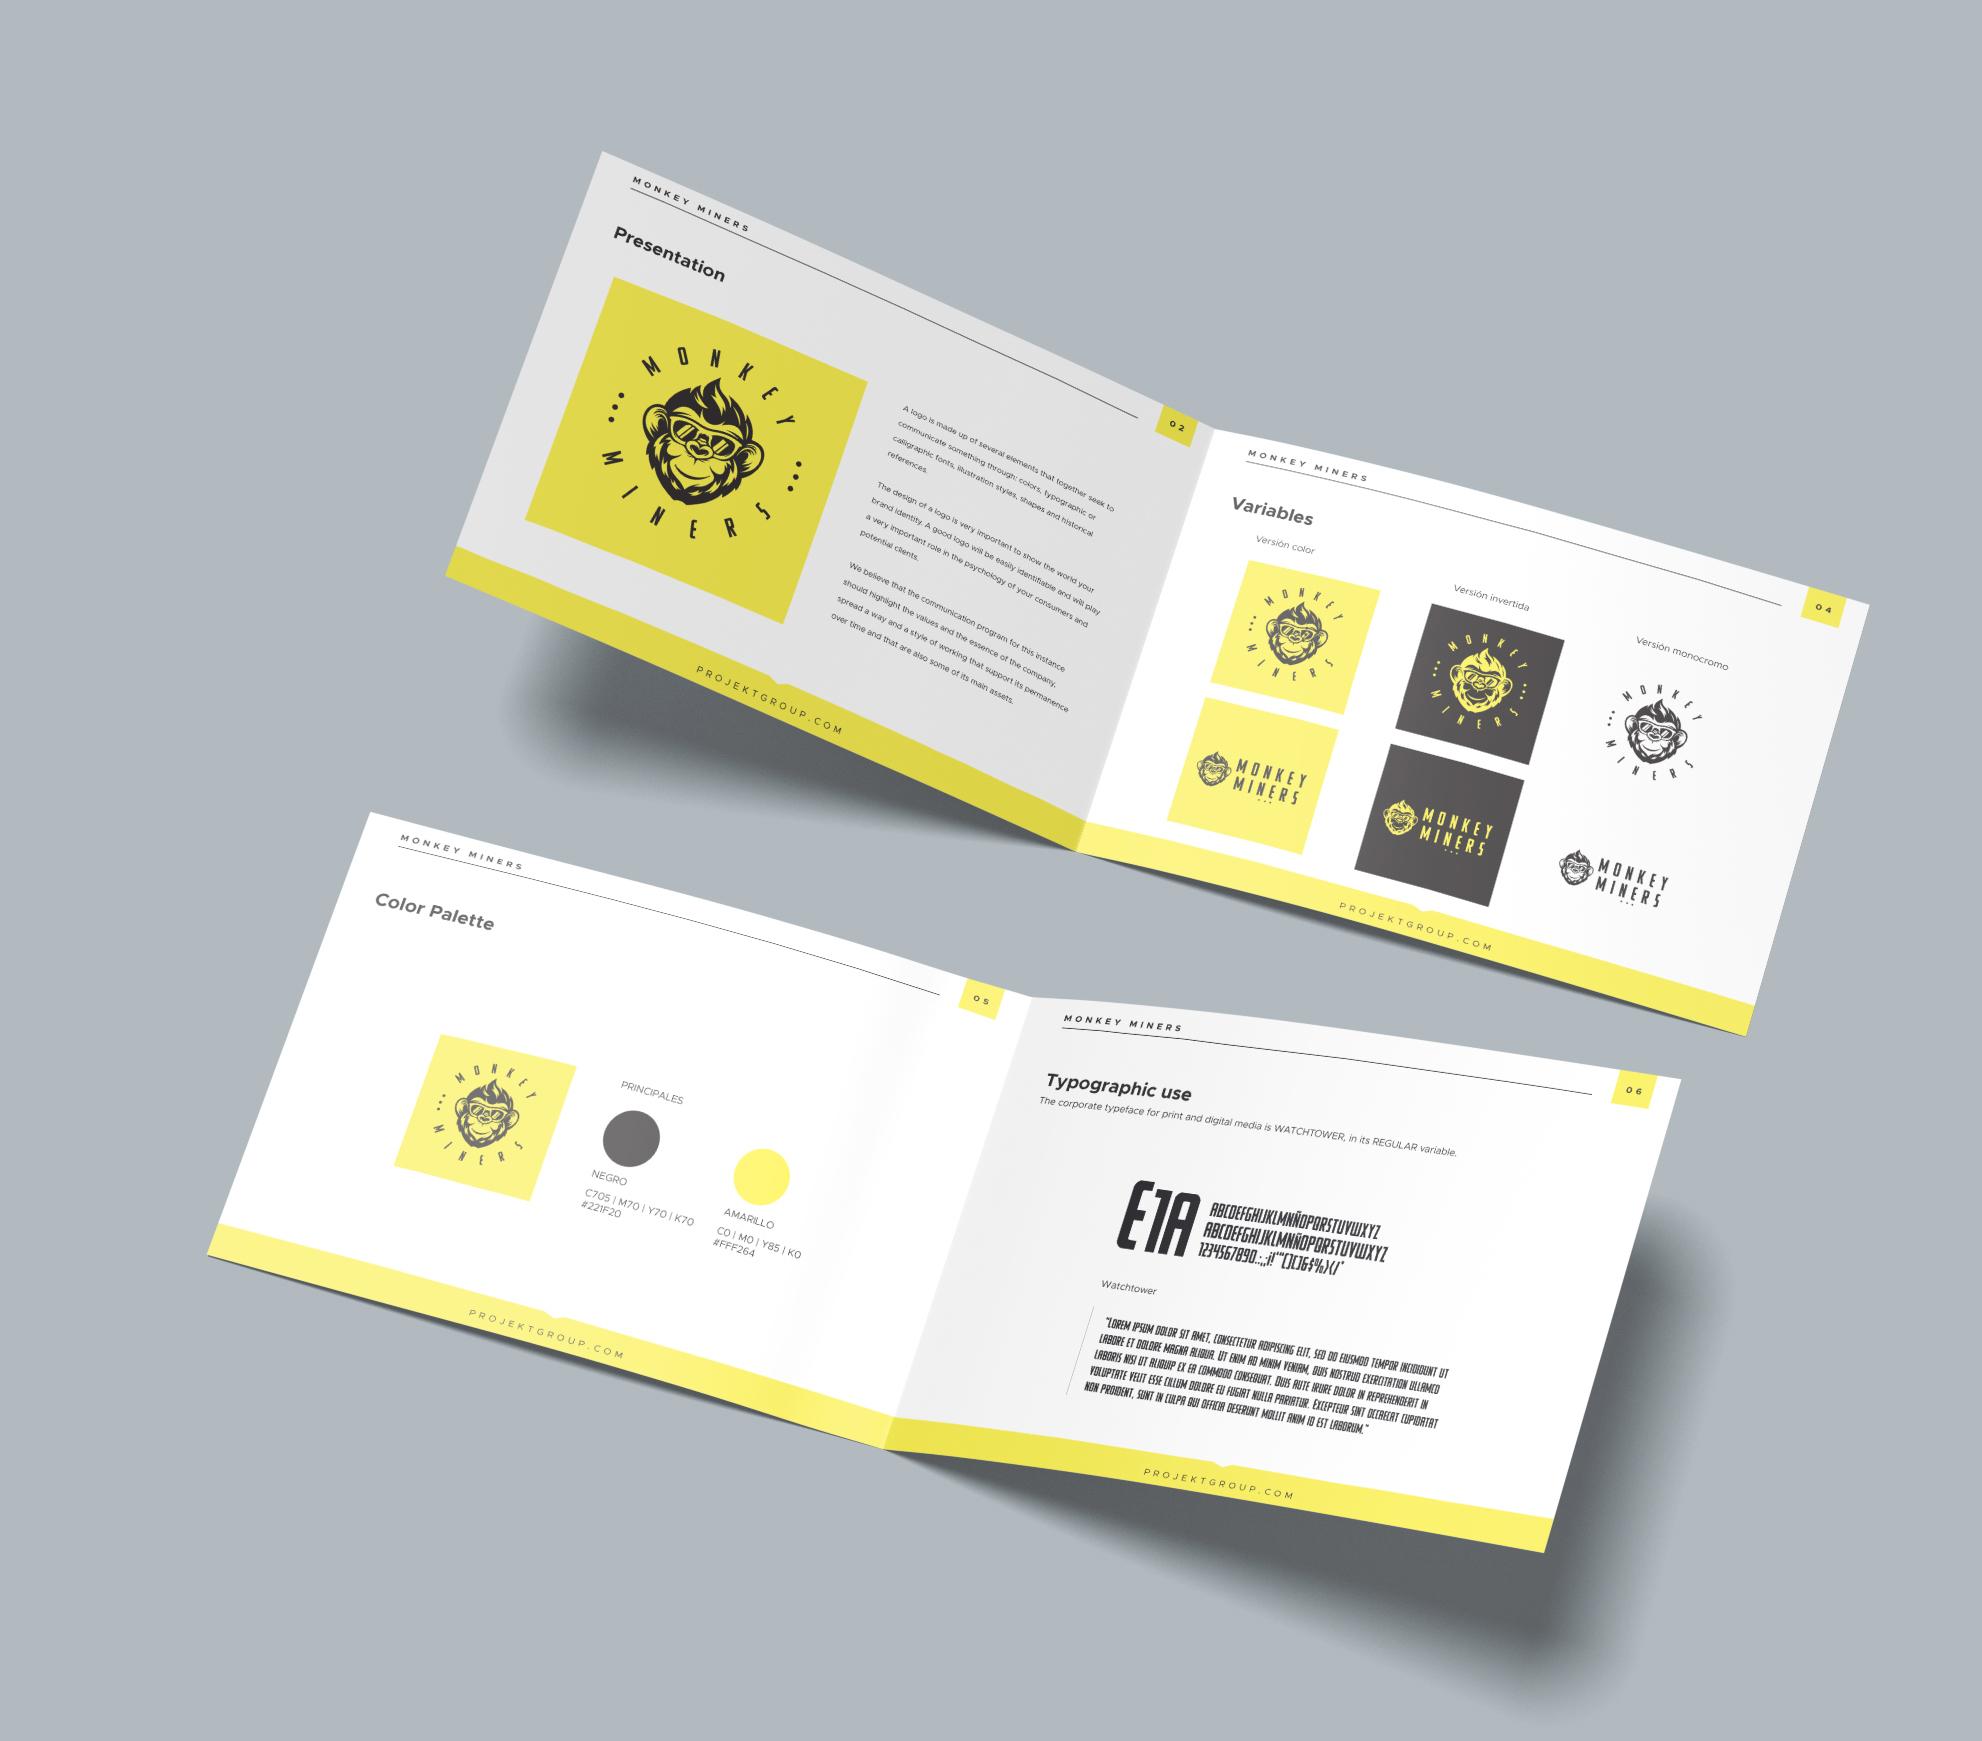 Projekt Group Branding -  Logotype and Branding Manual - Branding Guide